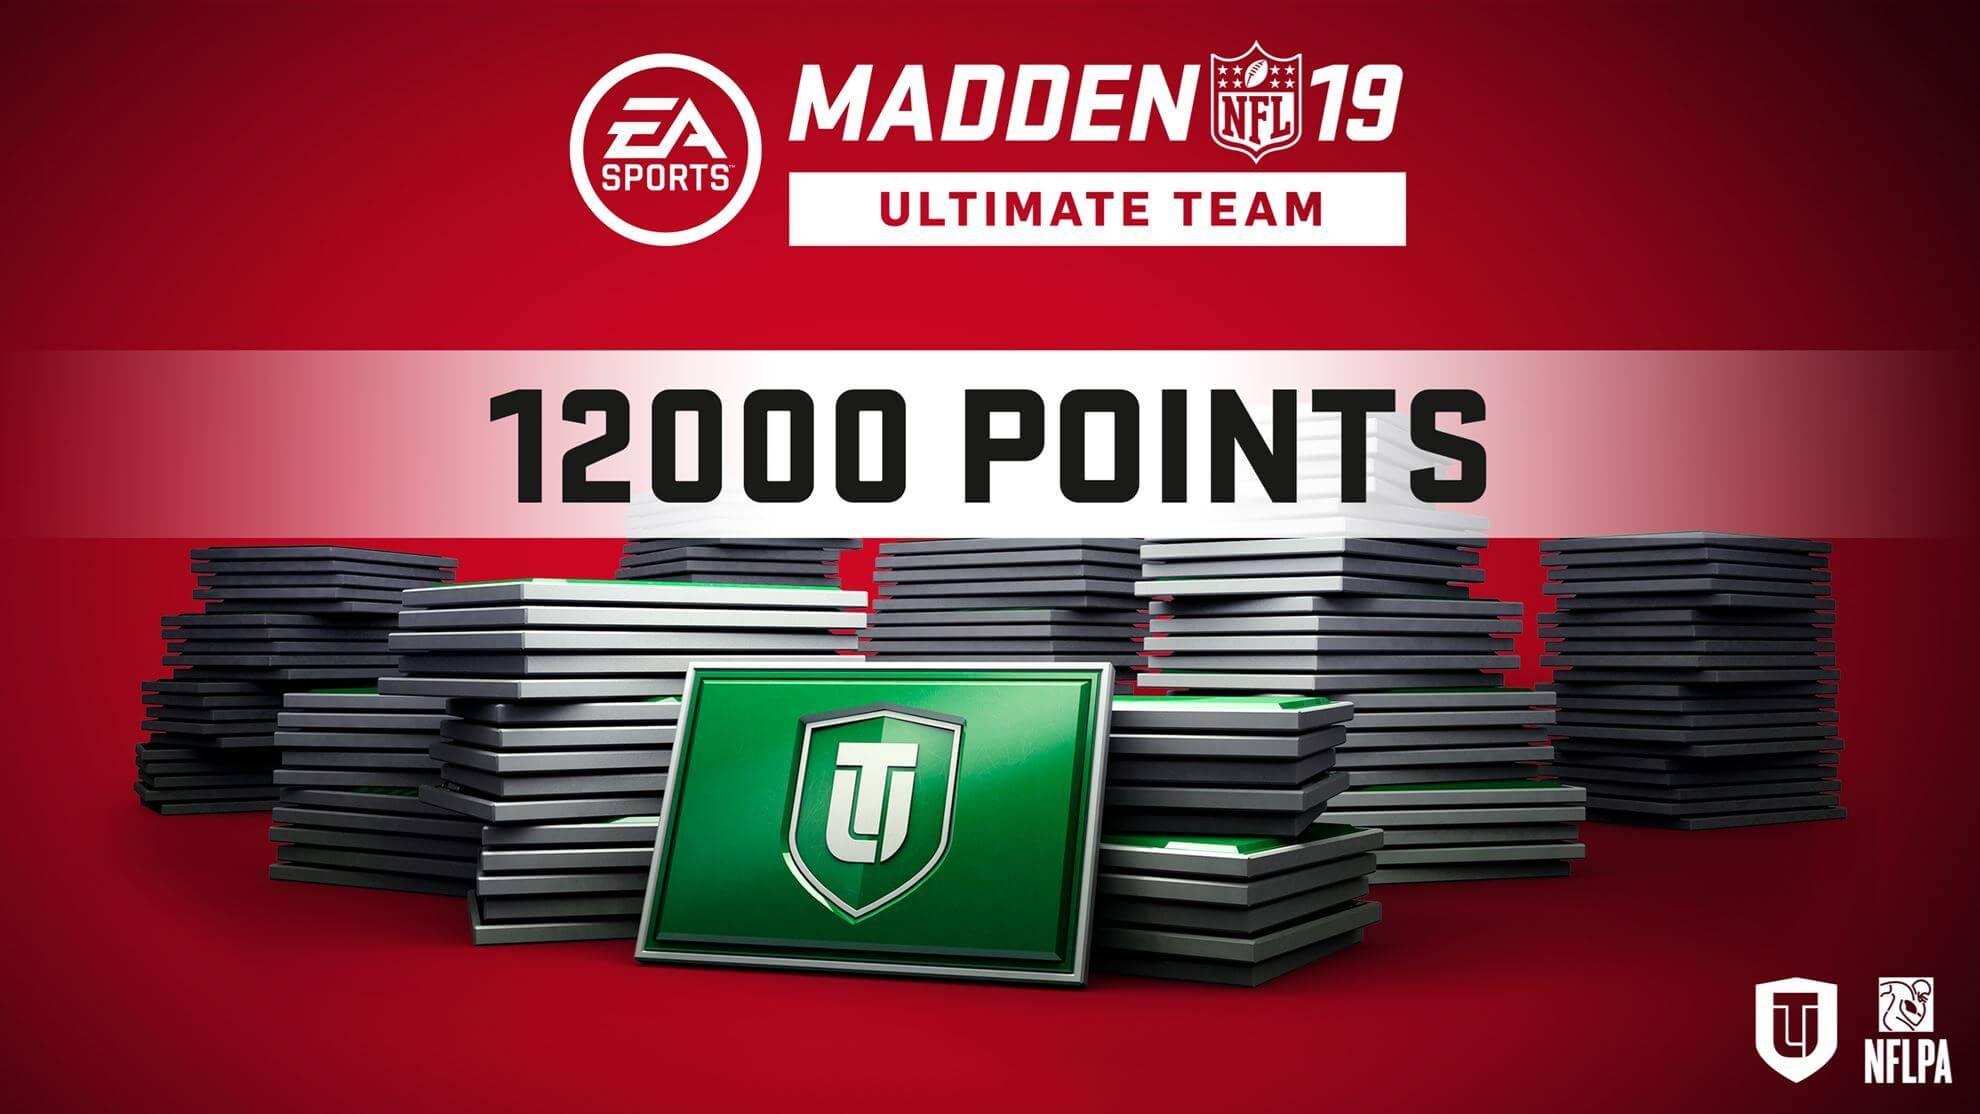 Madden NFL 19 Ultimate Team 12000 Points Pack